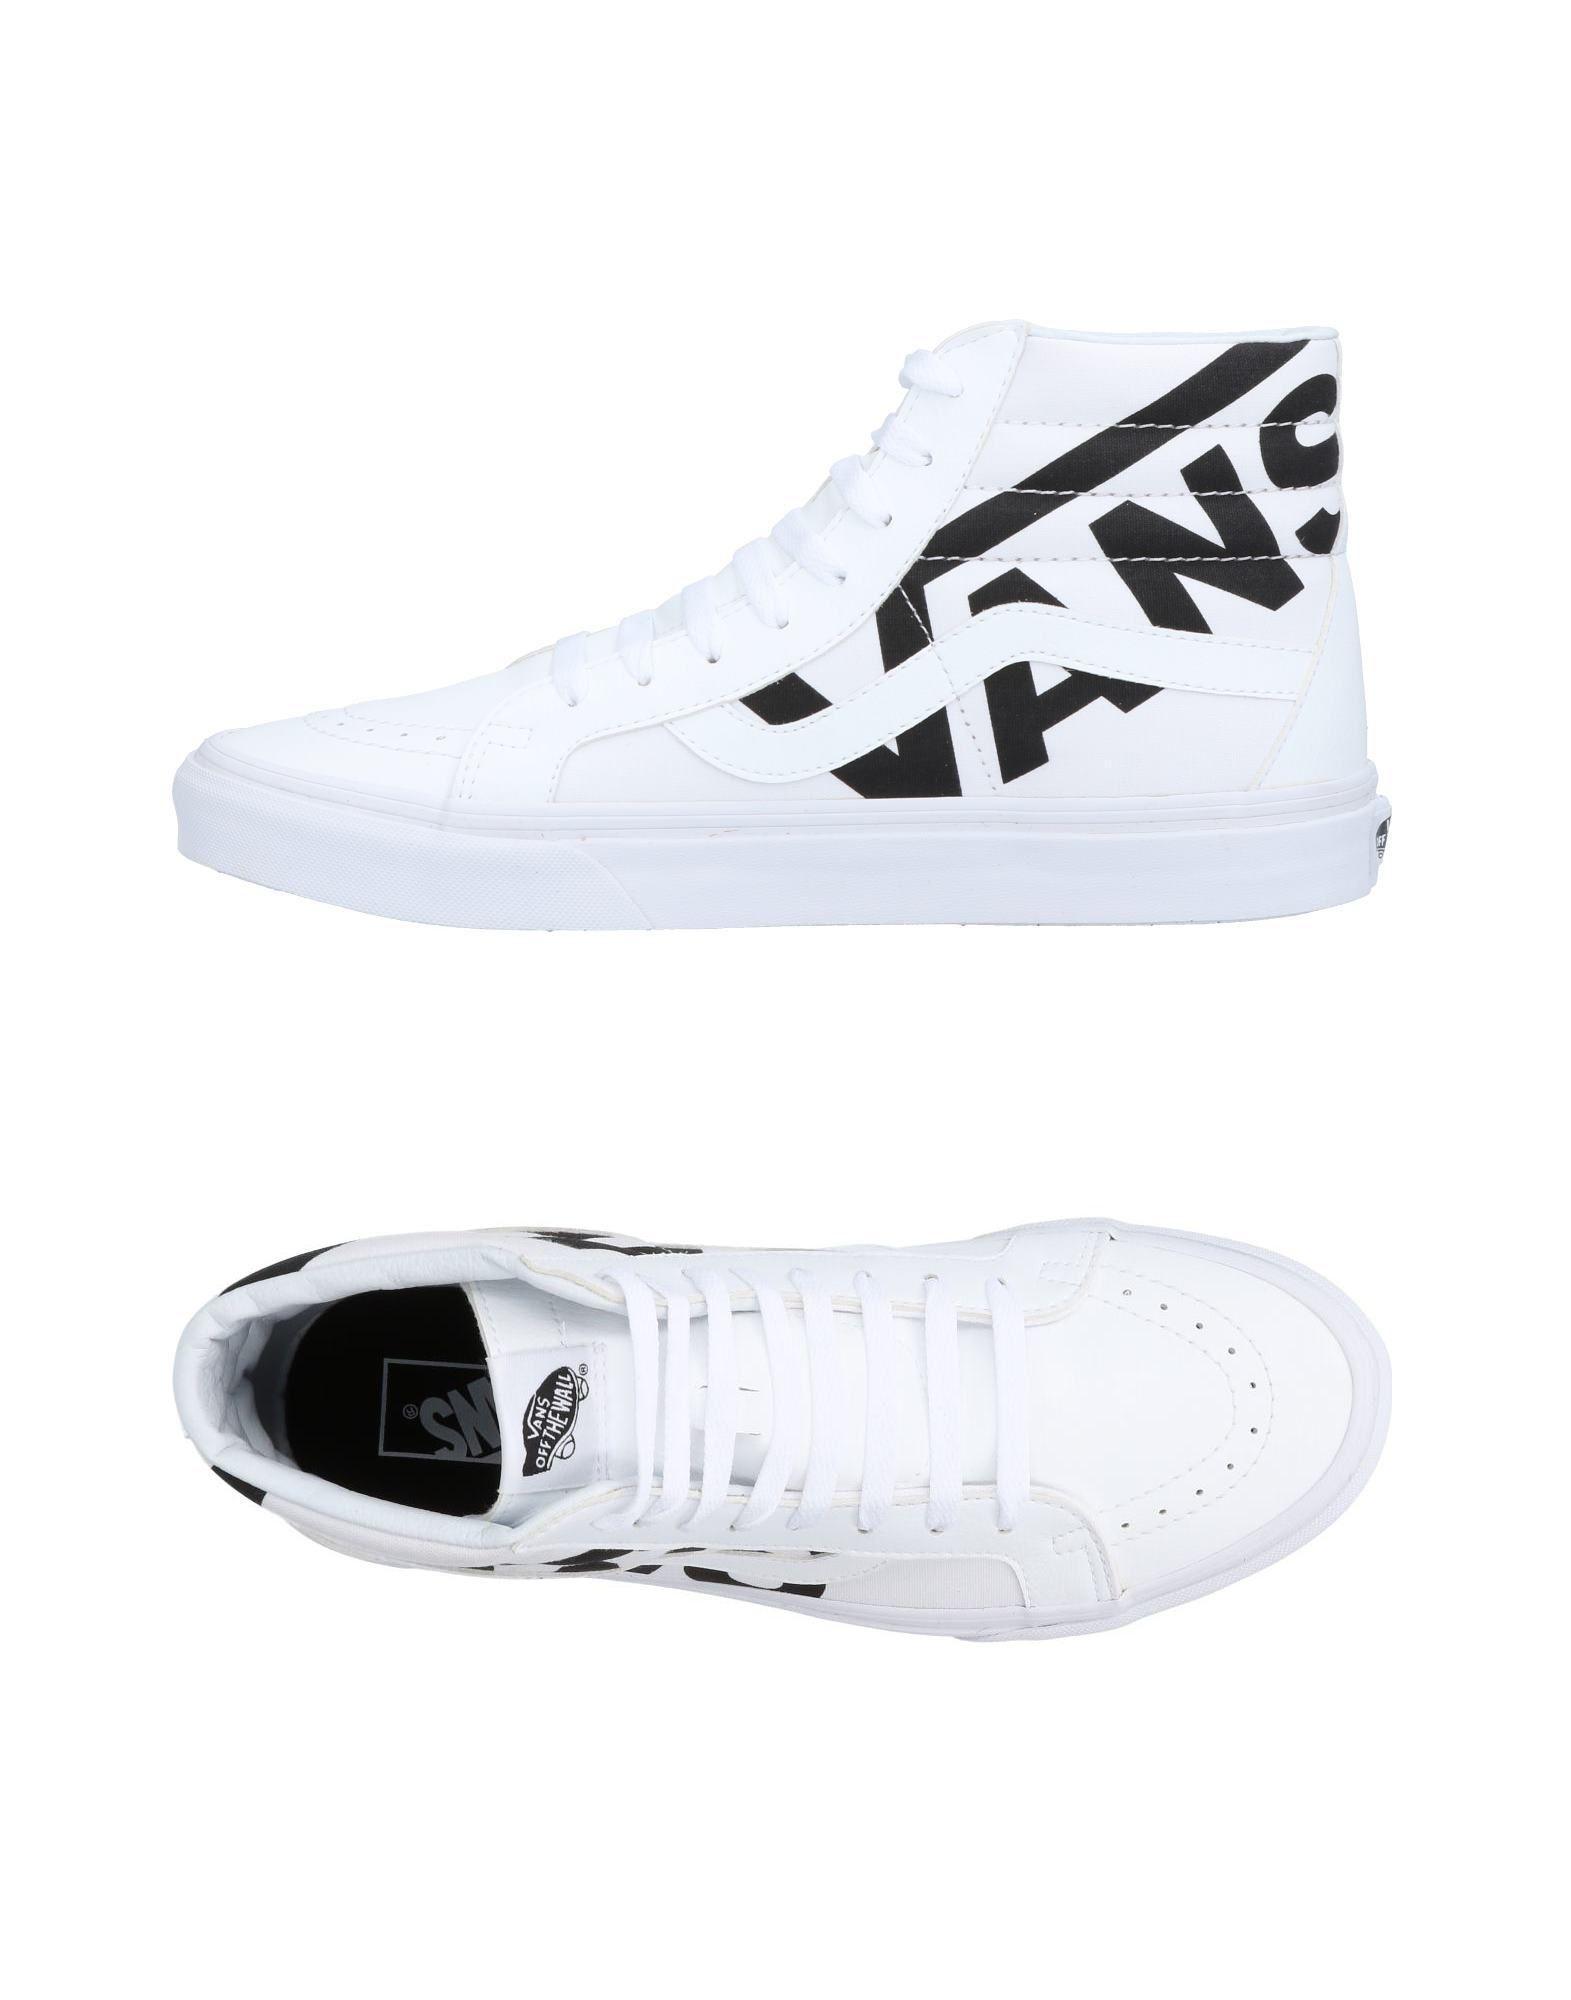 12c78954602 Vans - White High-tops   Sneakers for Men - Lyst. View fullscreen